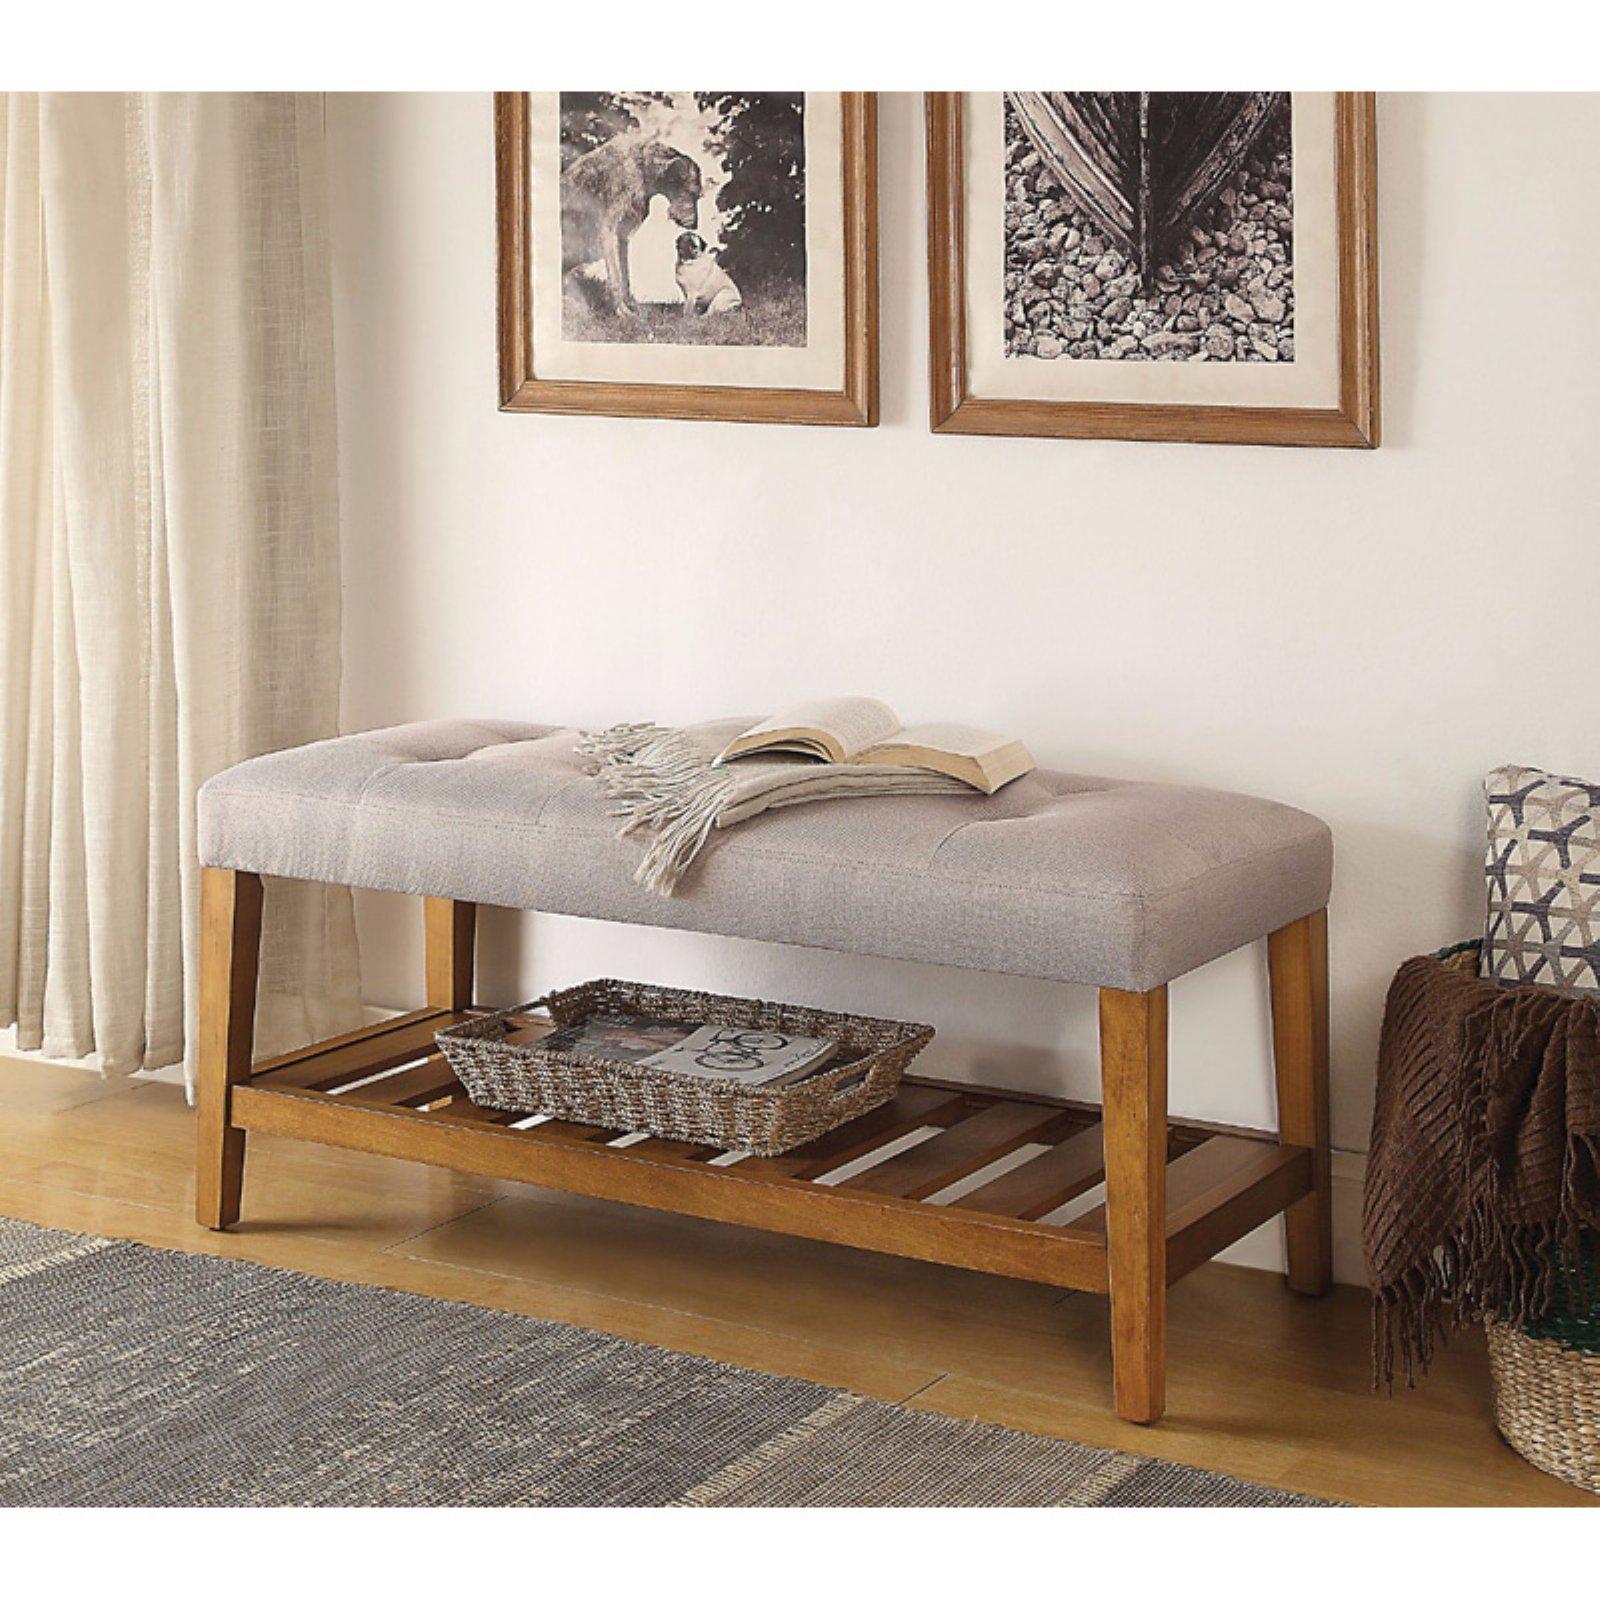 Wooden Bench, Light Gray & Oak